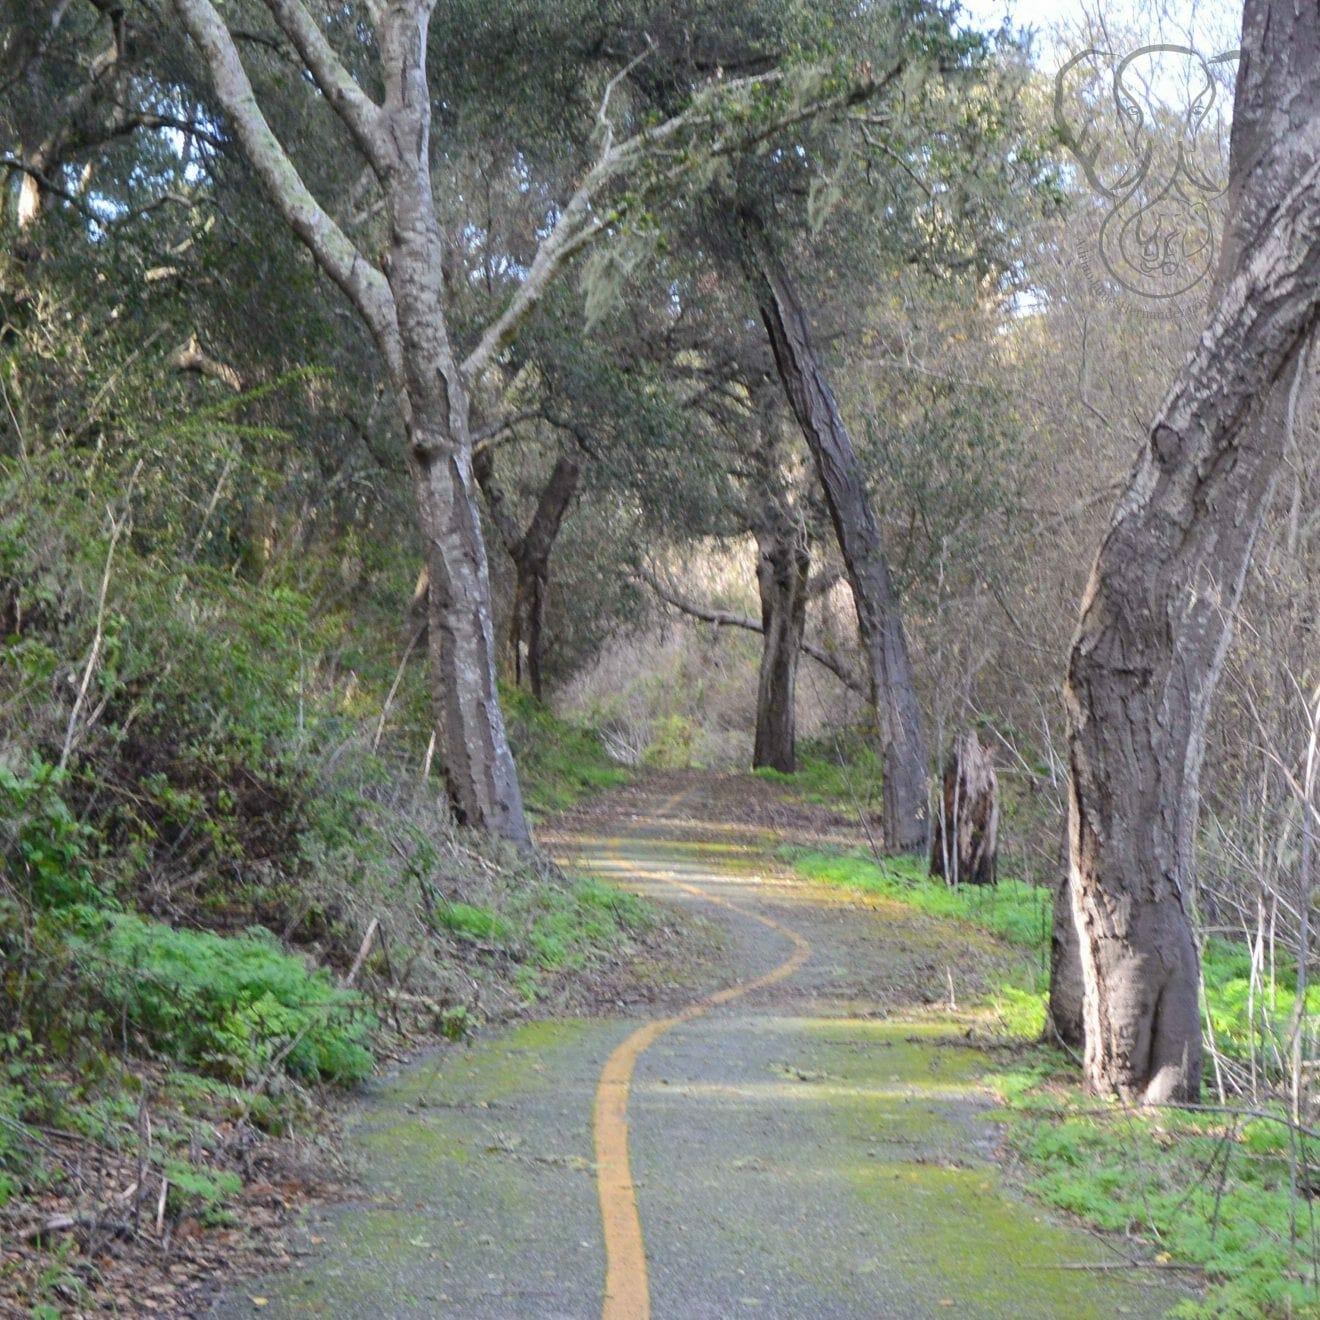 Bike path in California (Miranda Hernandez)